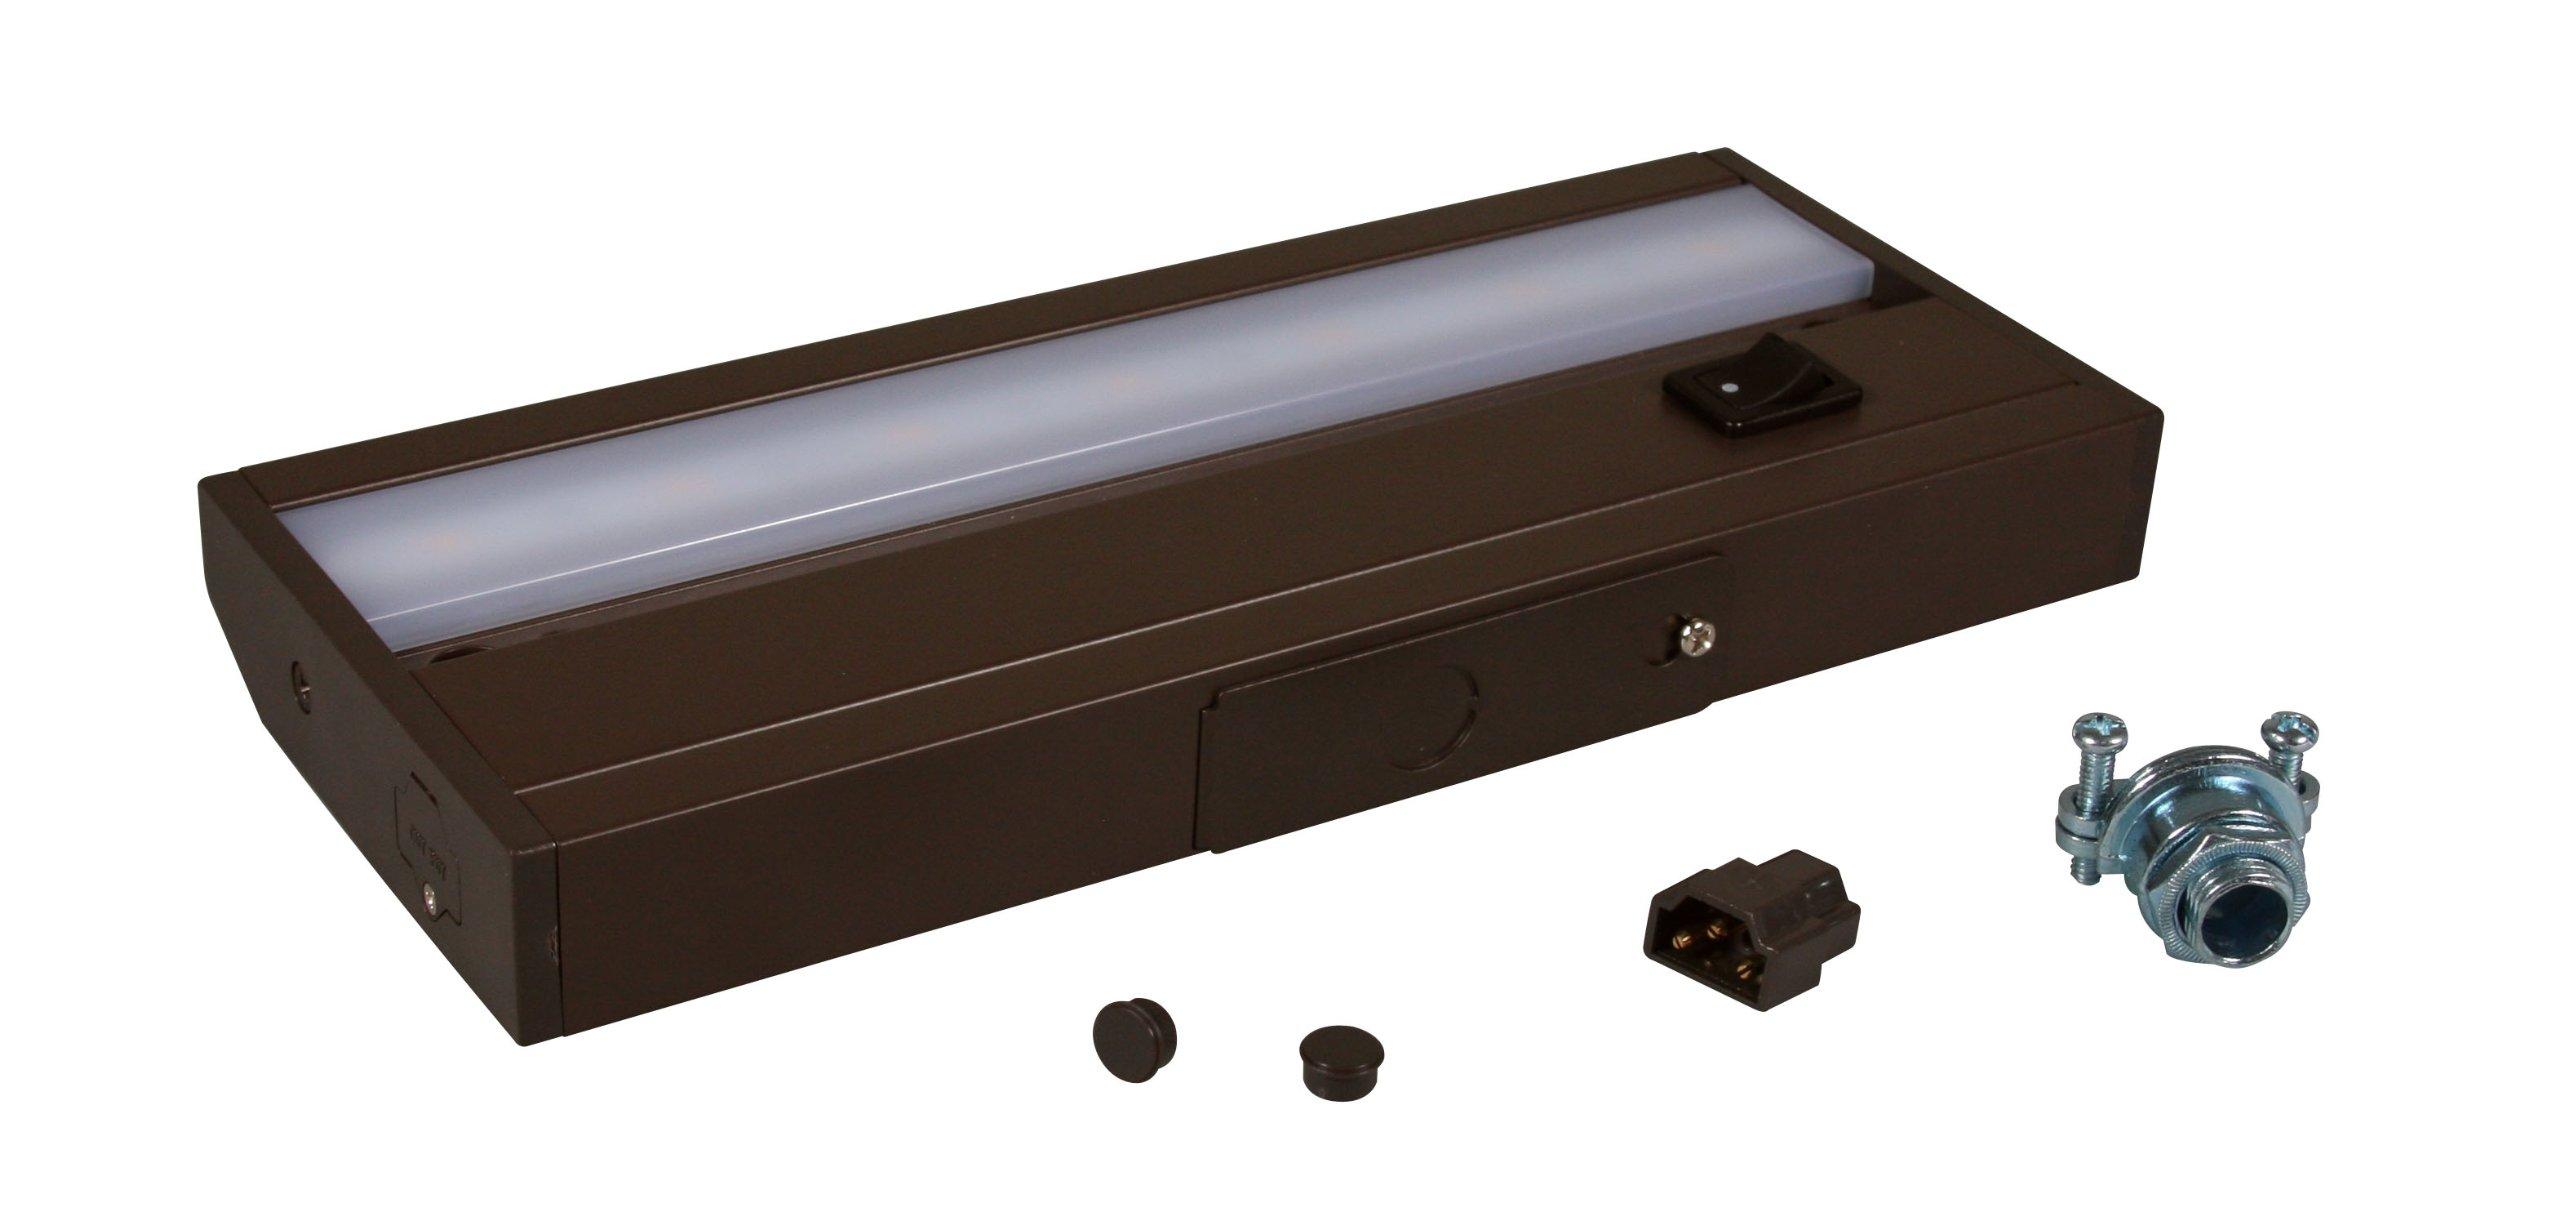 American Lighting ALC-8-DB LED Complete Under Cabinet Light, 3-Watt, 120-Volt Dimmable Warm White, 8-Inch, Dark Bronze